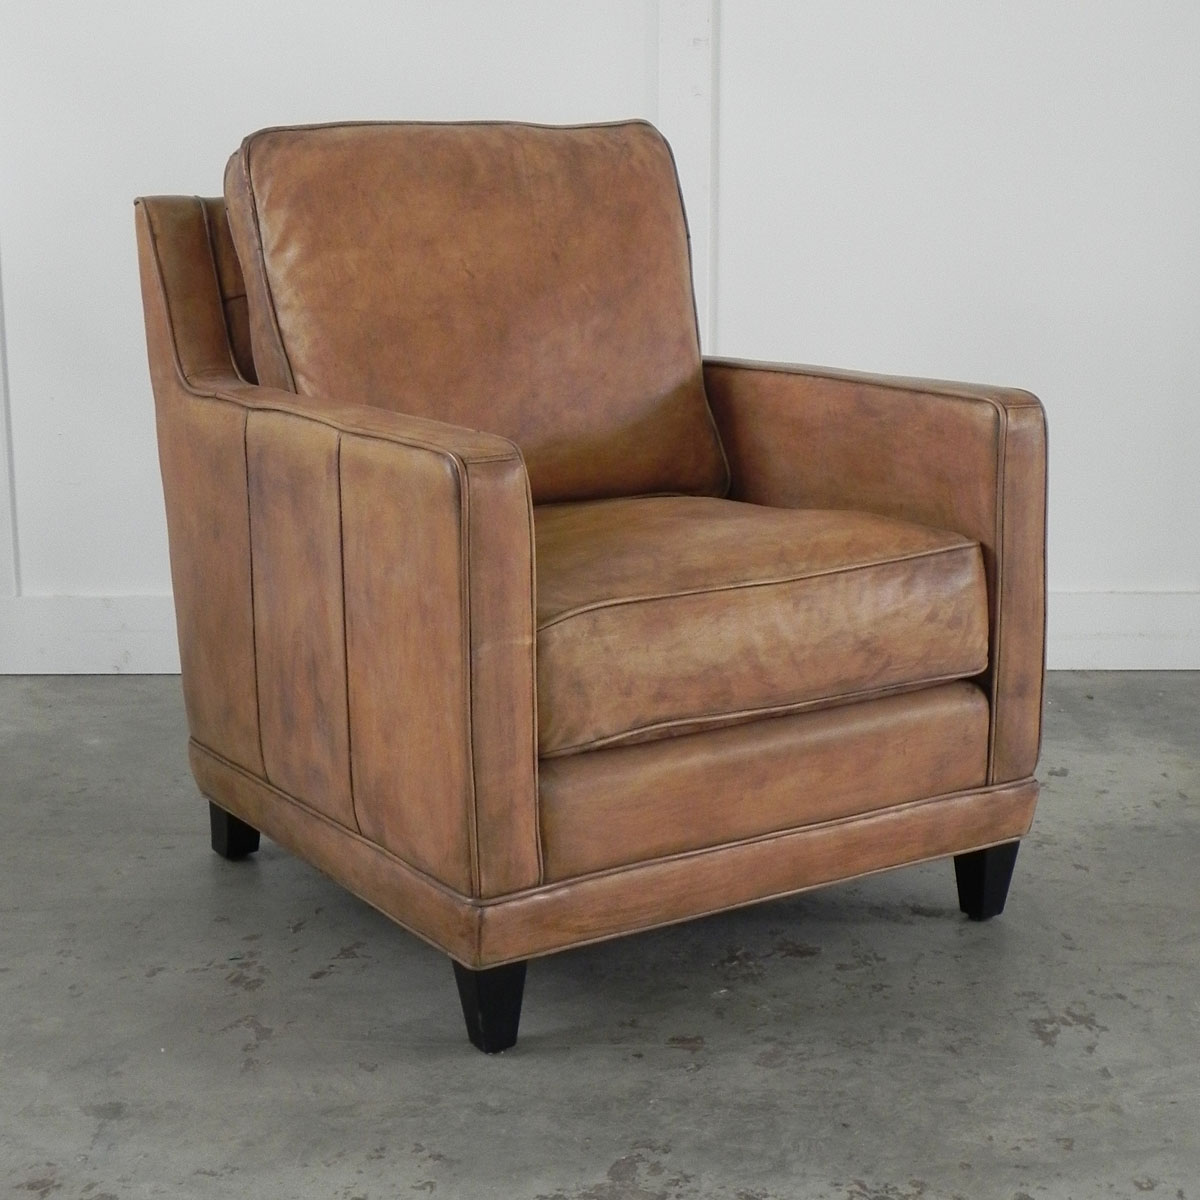 Phenomenal Upholstered Sofas Chairs Englishmans Fine Furnishings Cjindustries Chair Design For Home Cjindustriesco